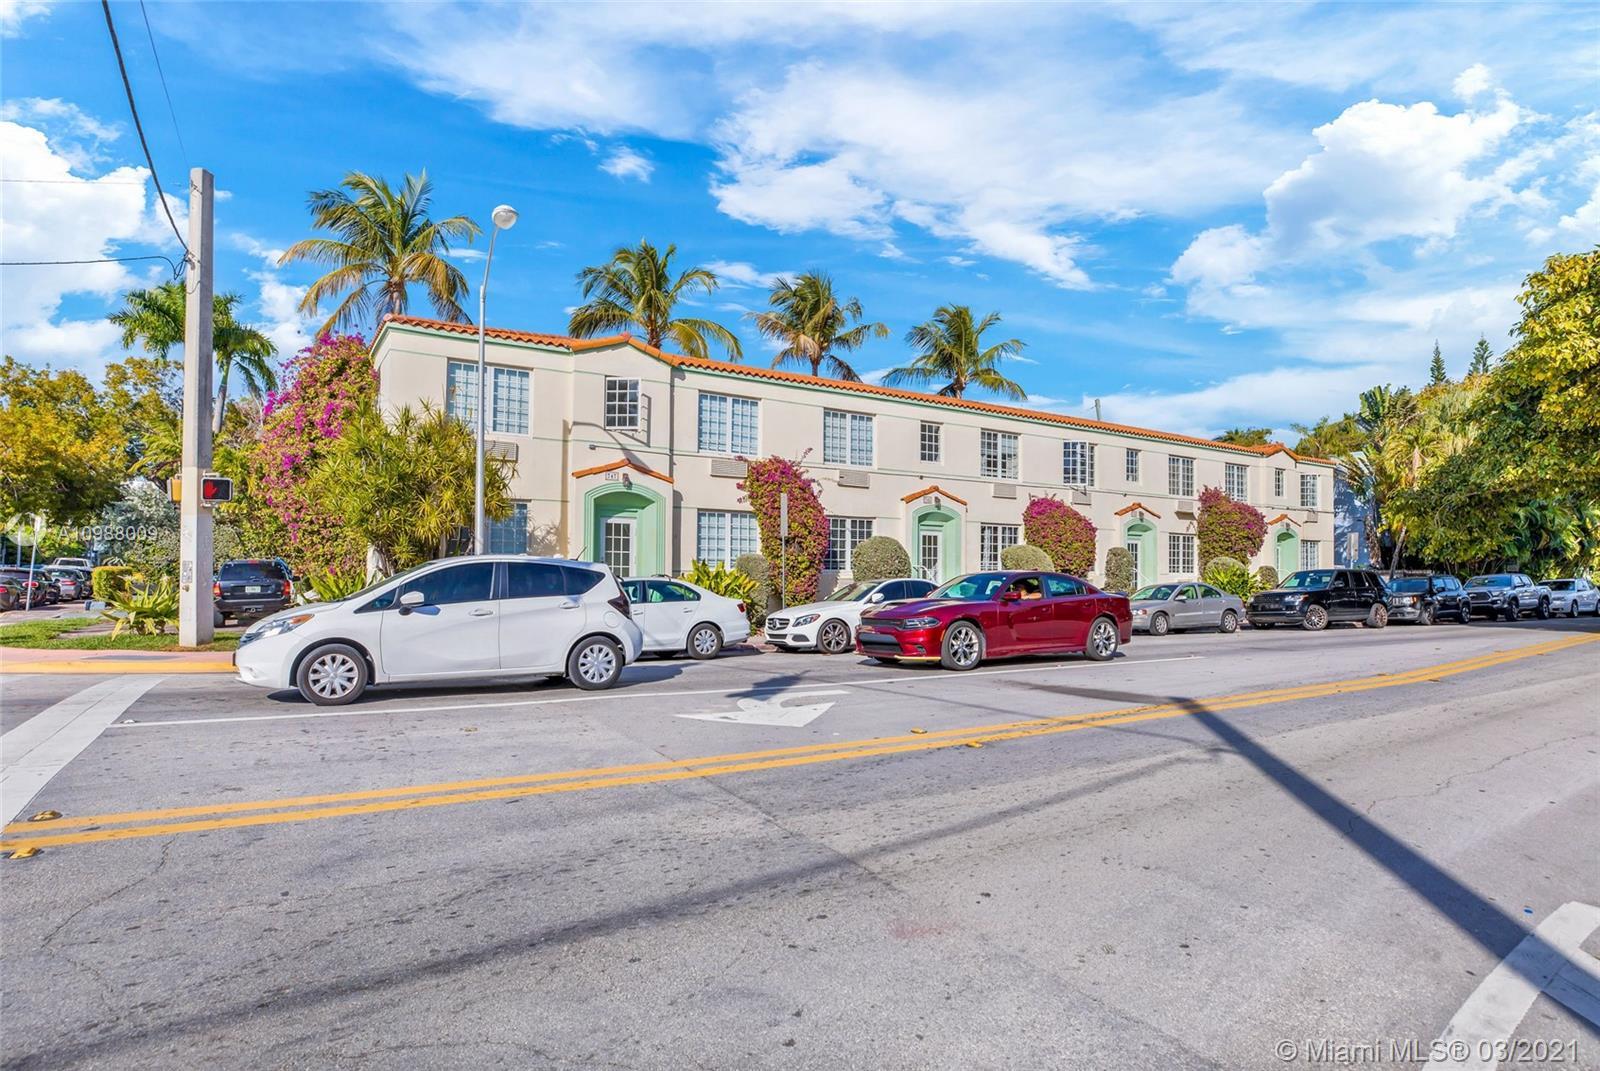 741 15th St # 12A, Miami Beach, Florida 33139, ,1 BathroomBathrooms,Residential,For Sale,741 15th St # 12A,A10988009